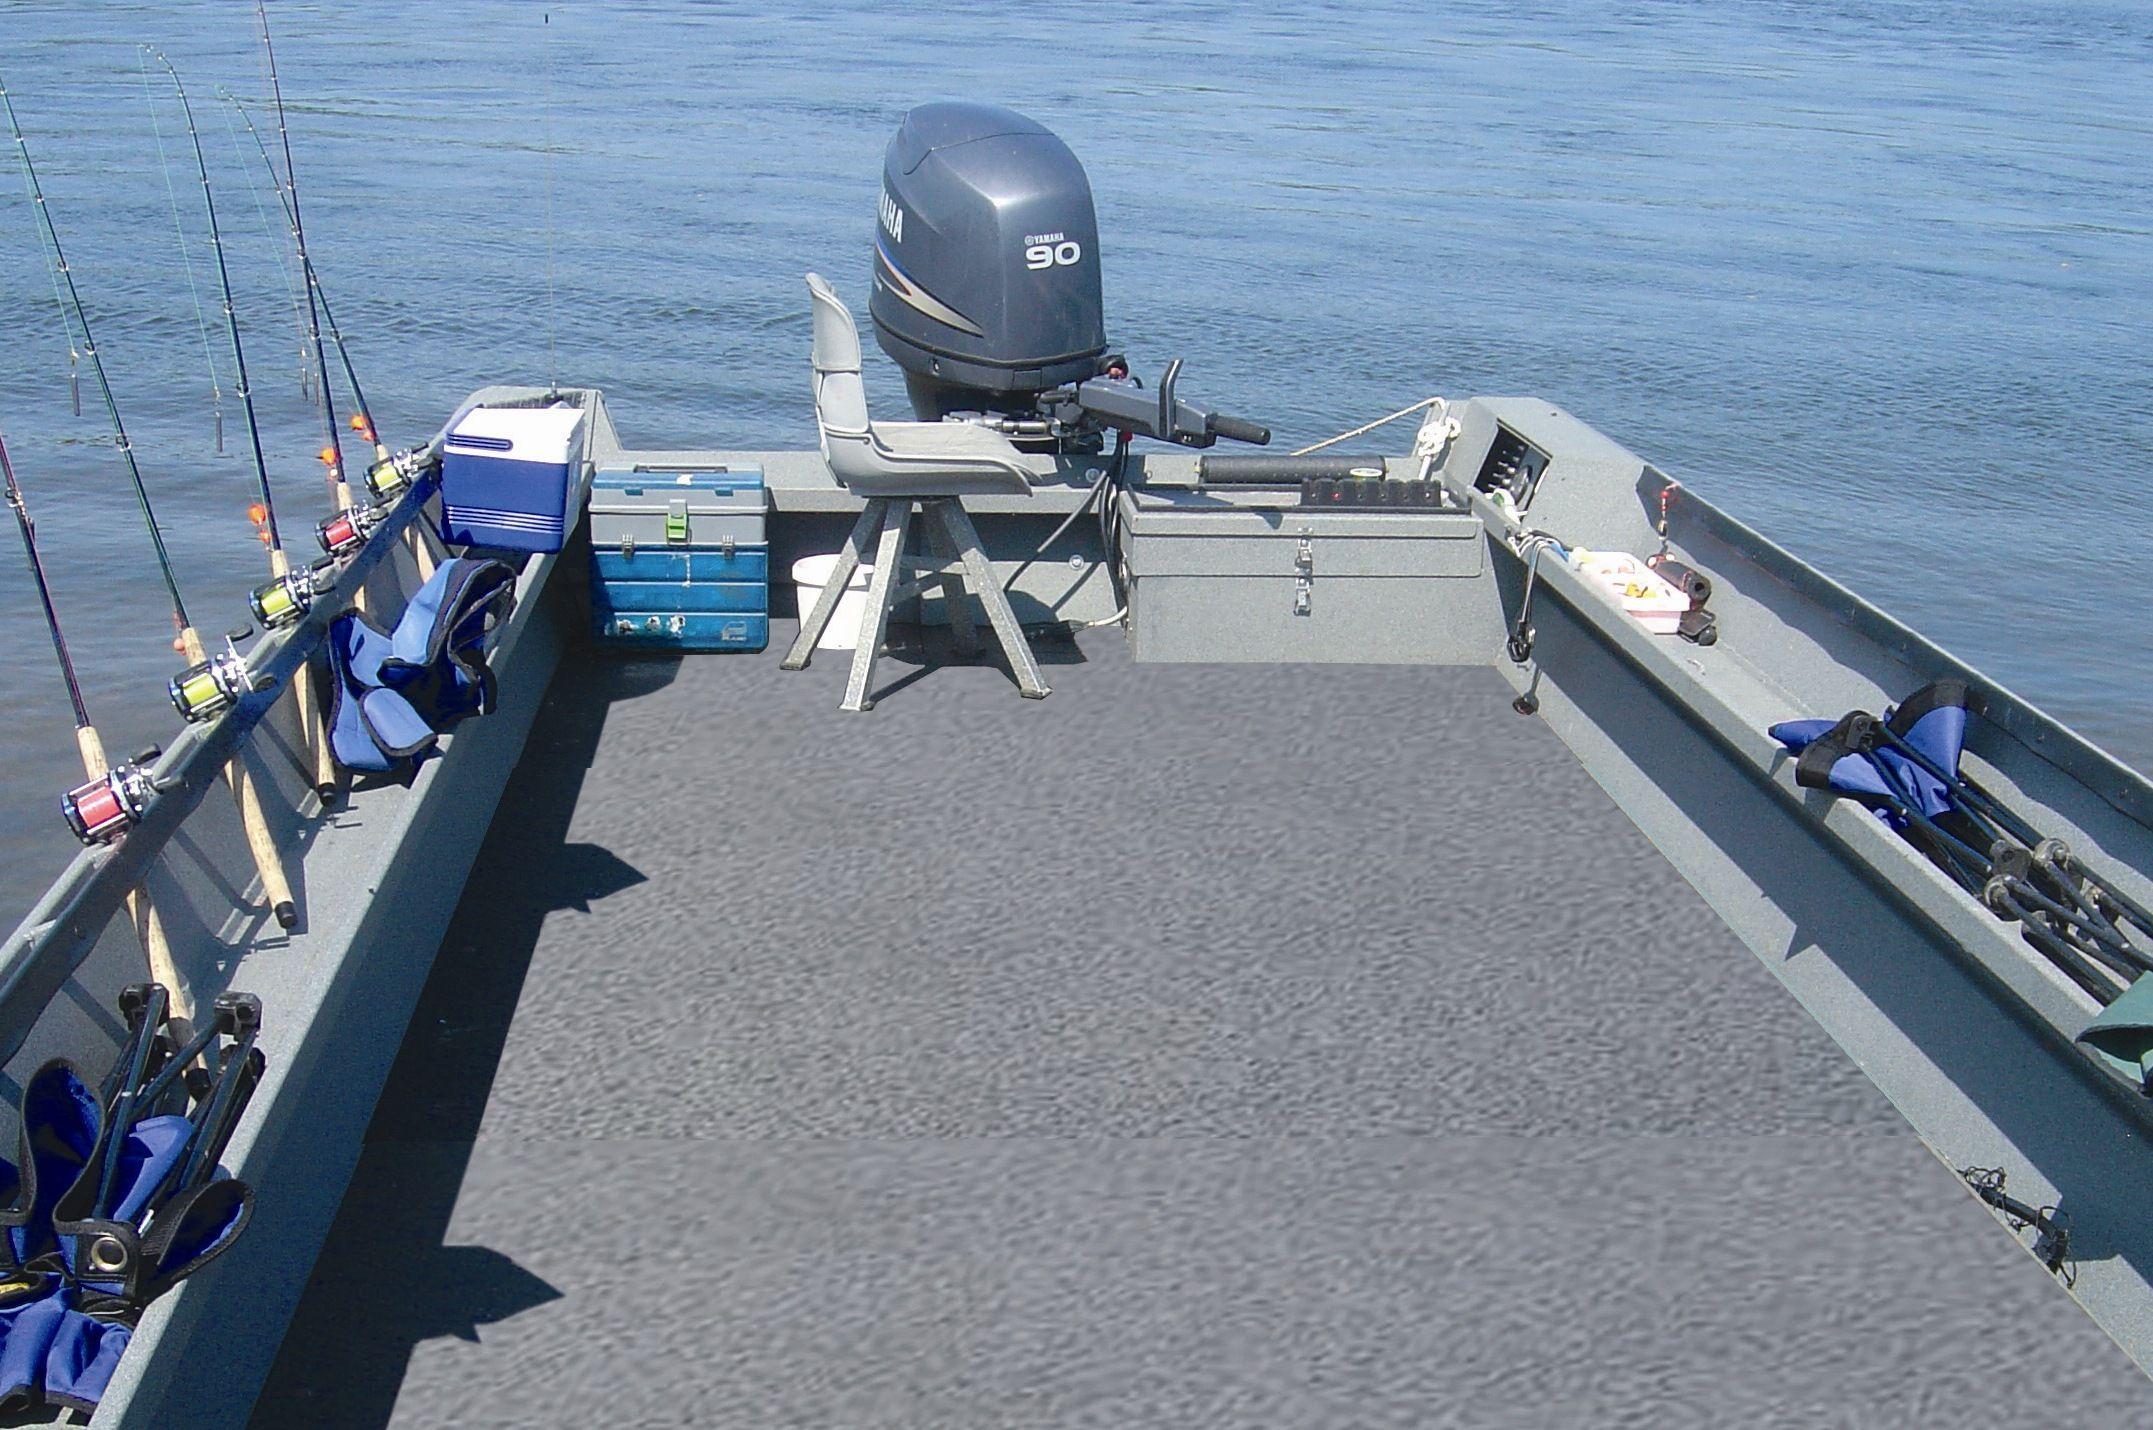 Dek Master For Boat Floor Solutions Vinyl Deck Deck Boat